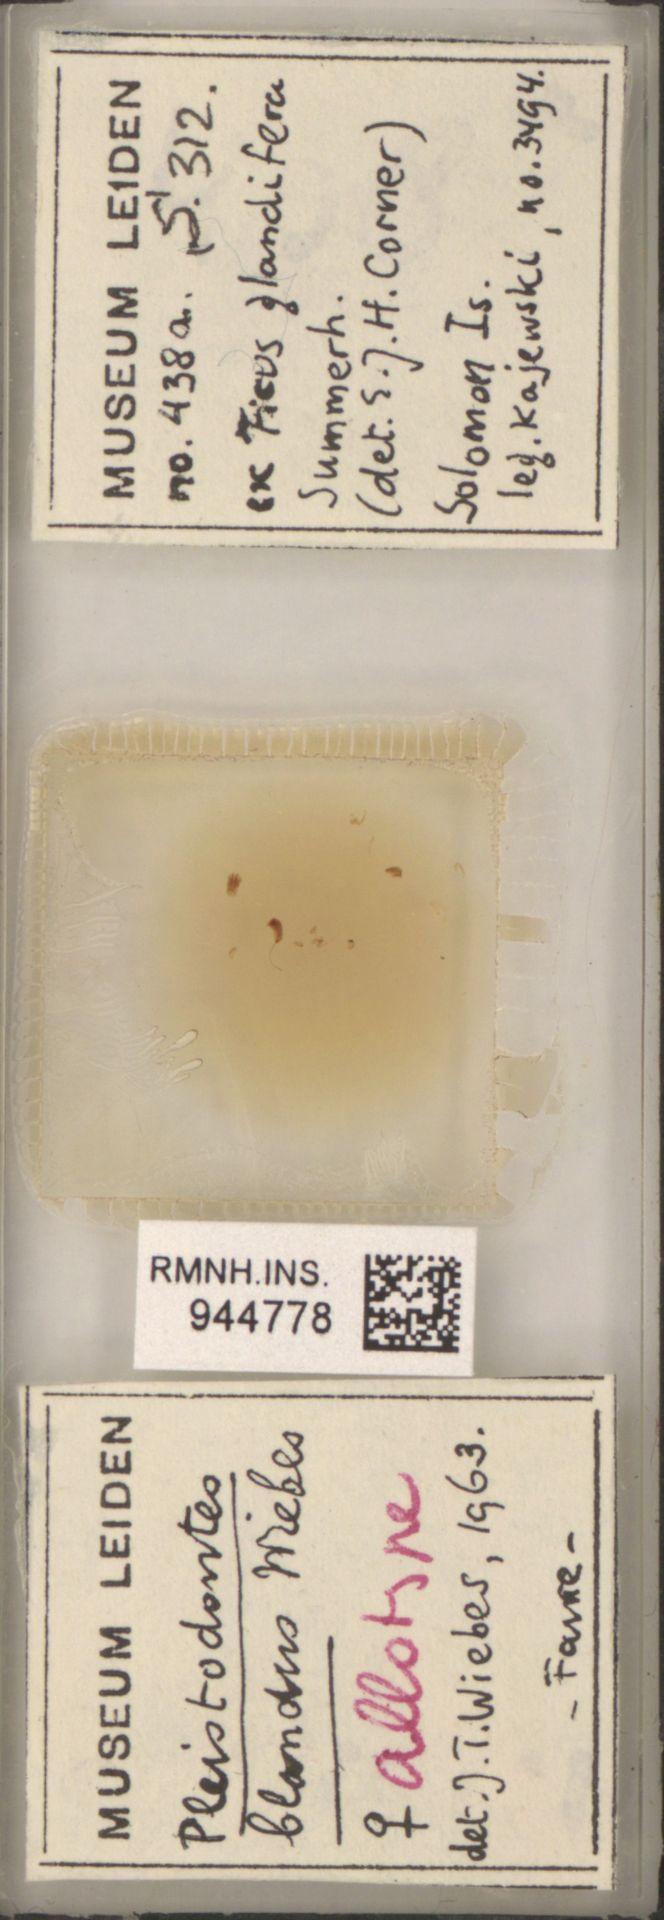 RMNH.INS.944778   Pleistodontes blandus Wiebes